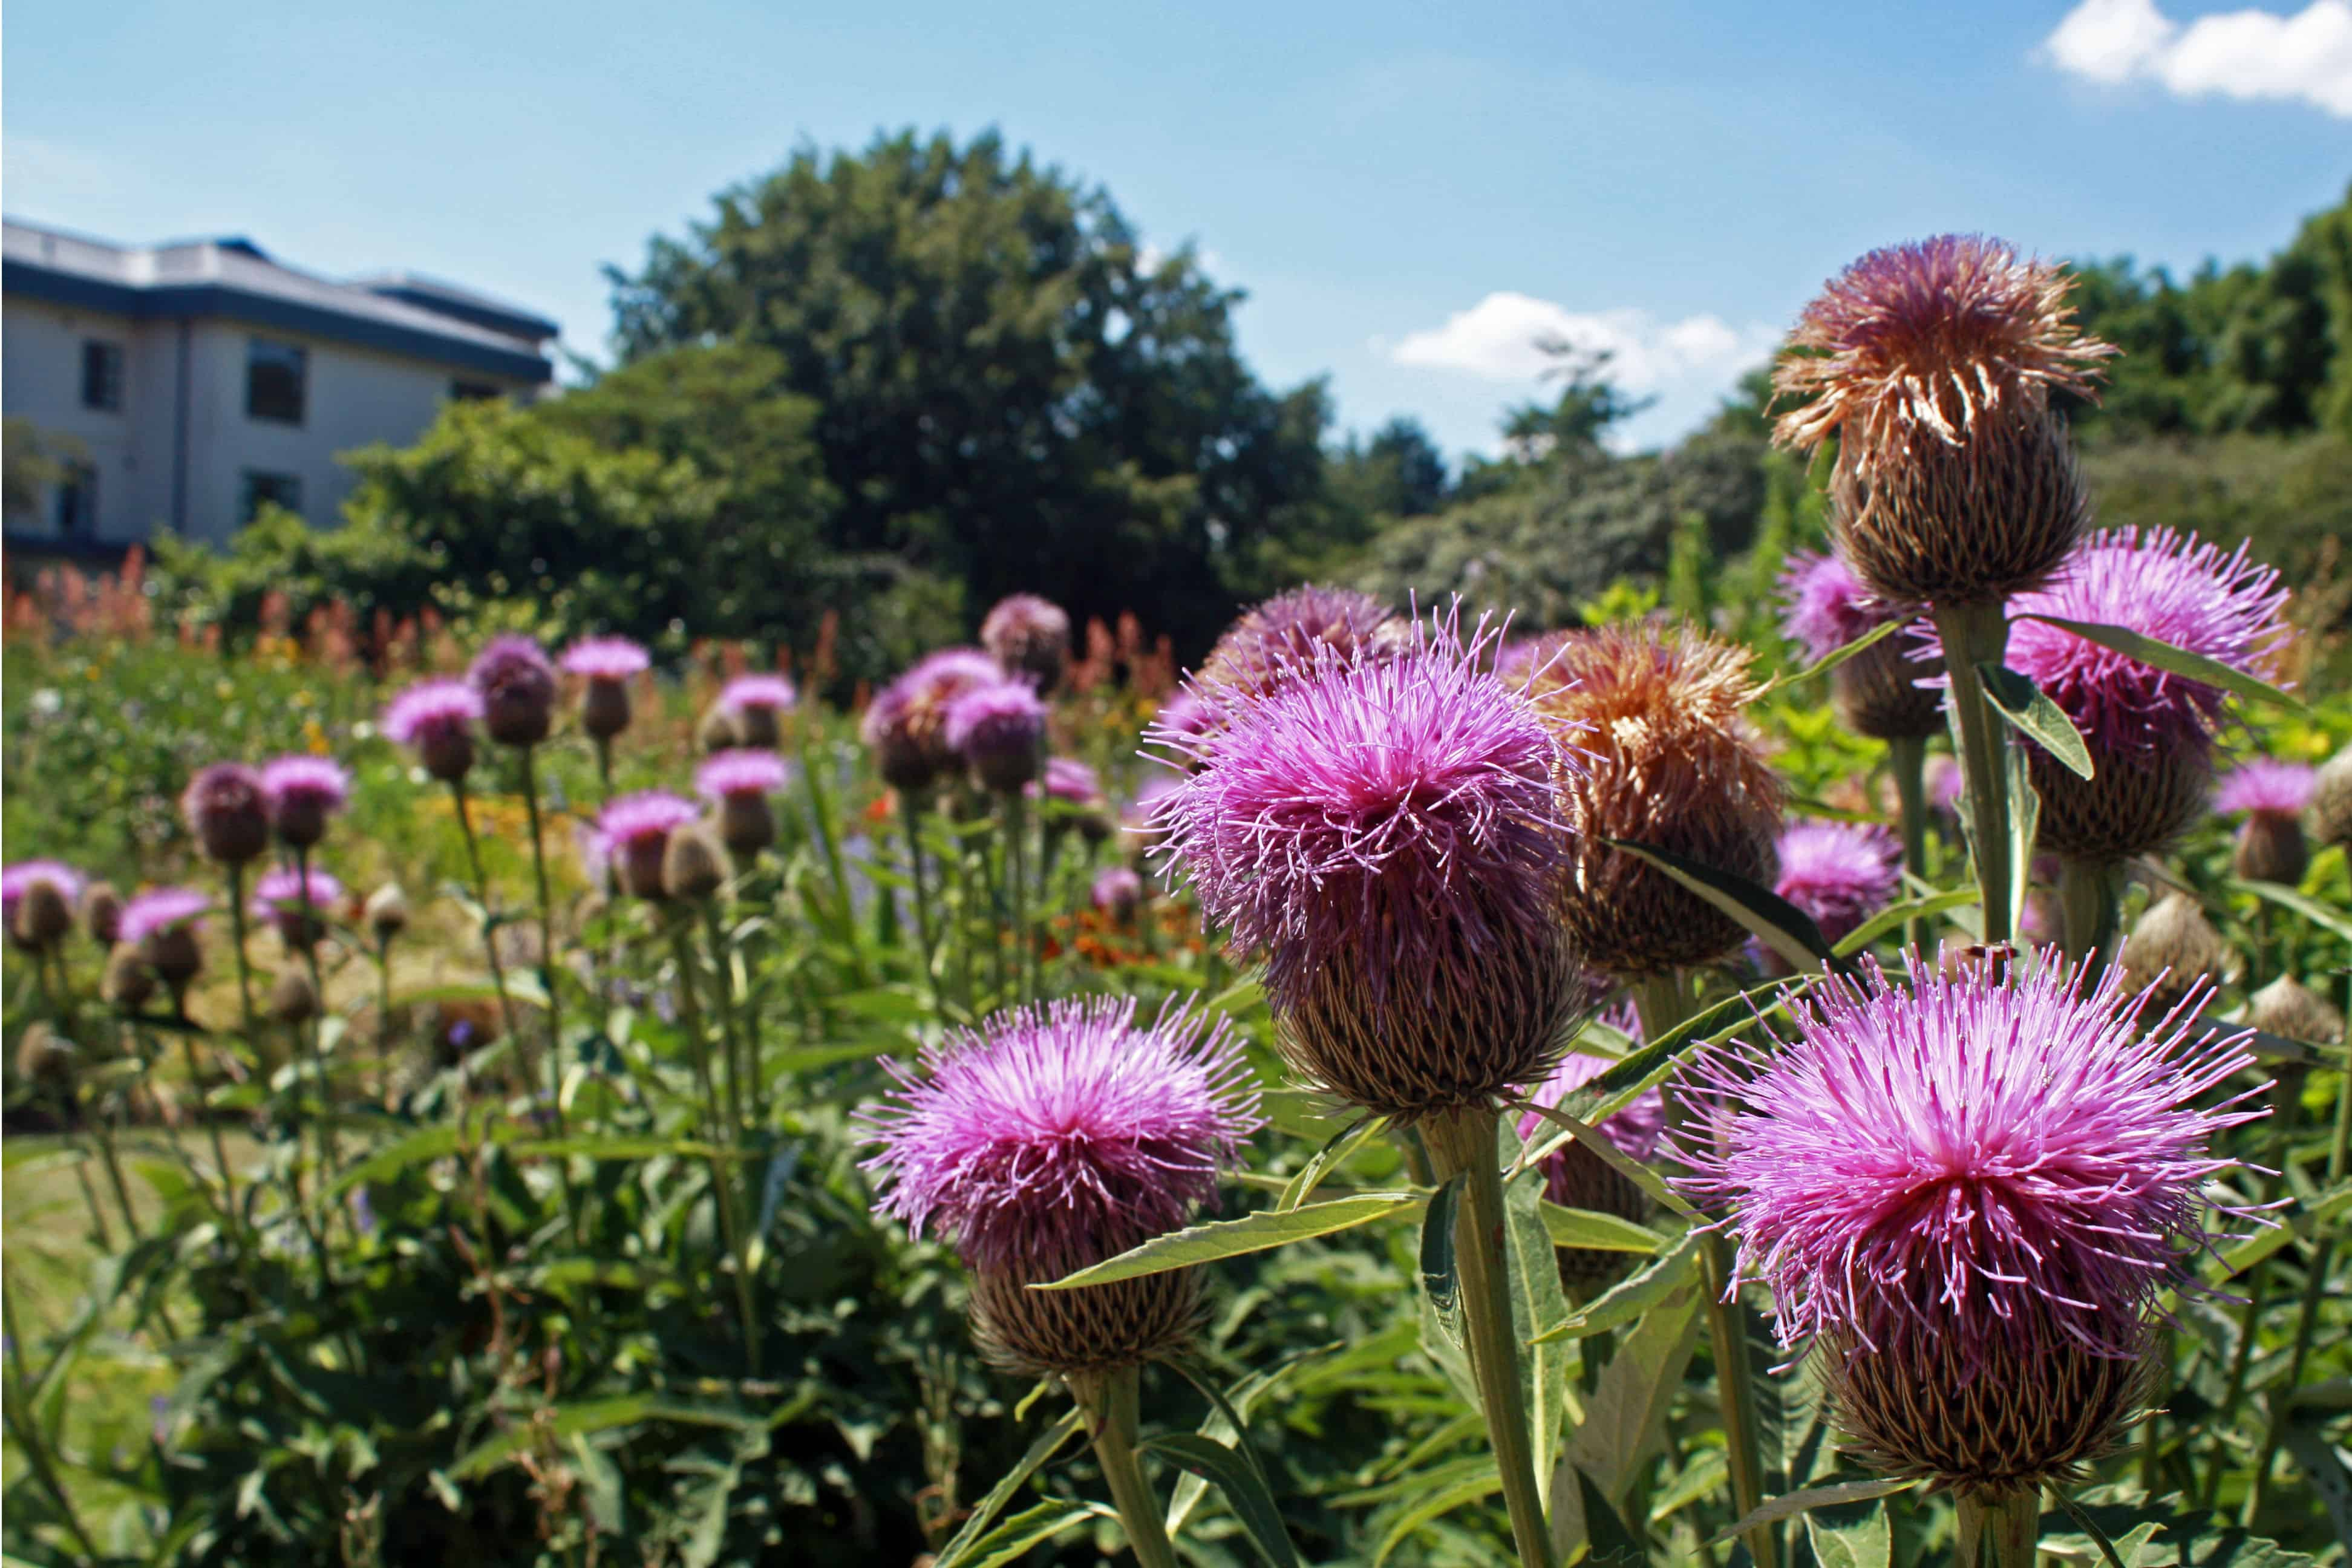 Thistles in Cambridge University Botanic Garden